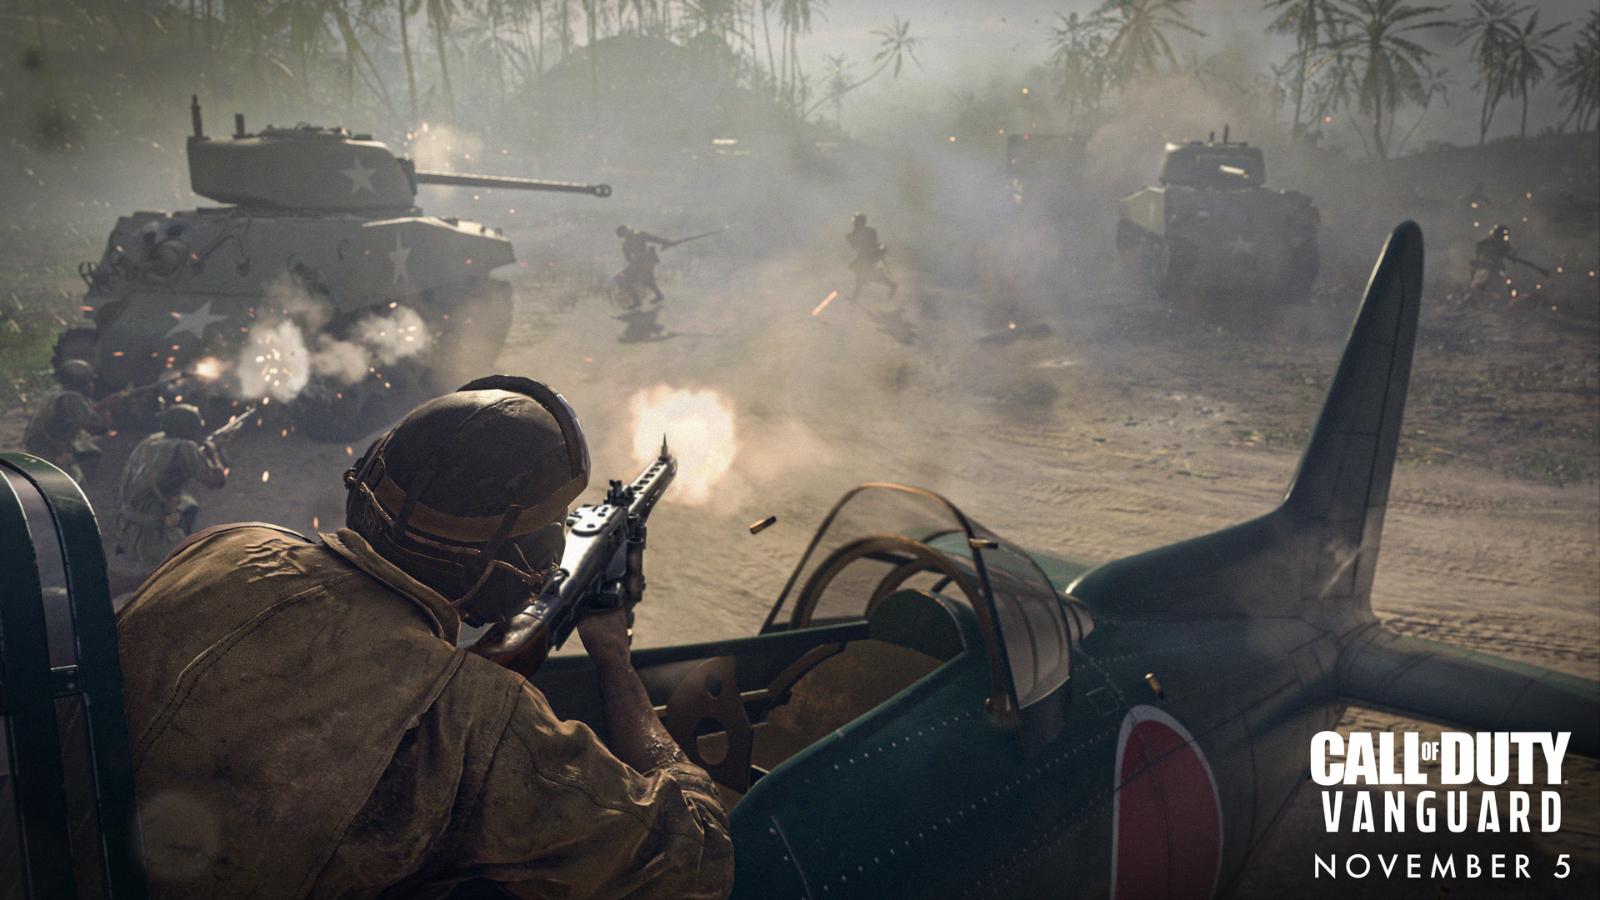 Alles over Call of Duty: Vanguard